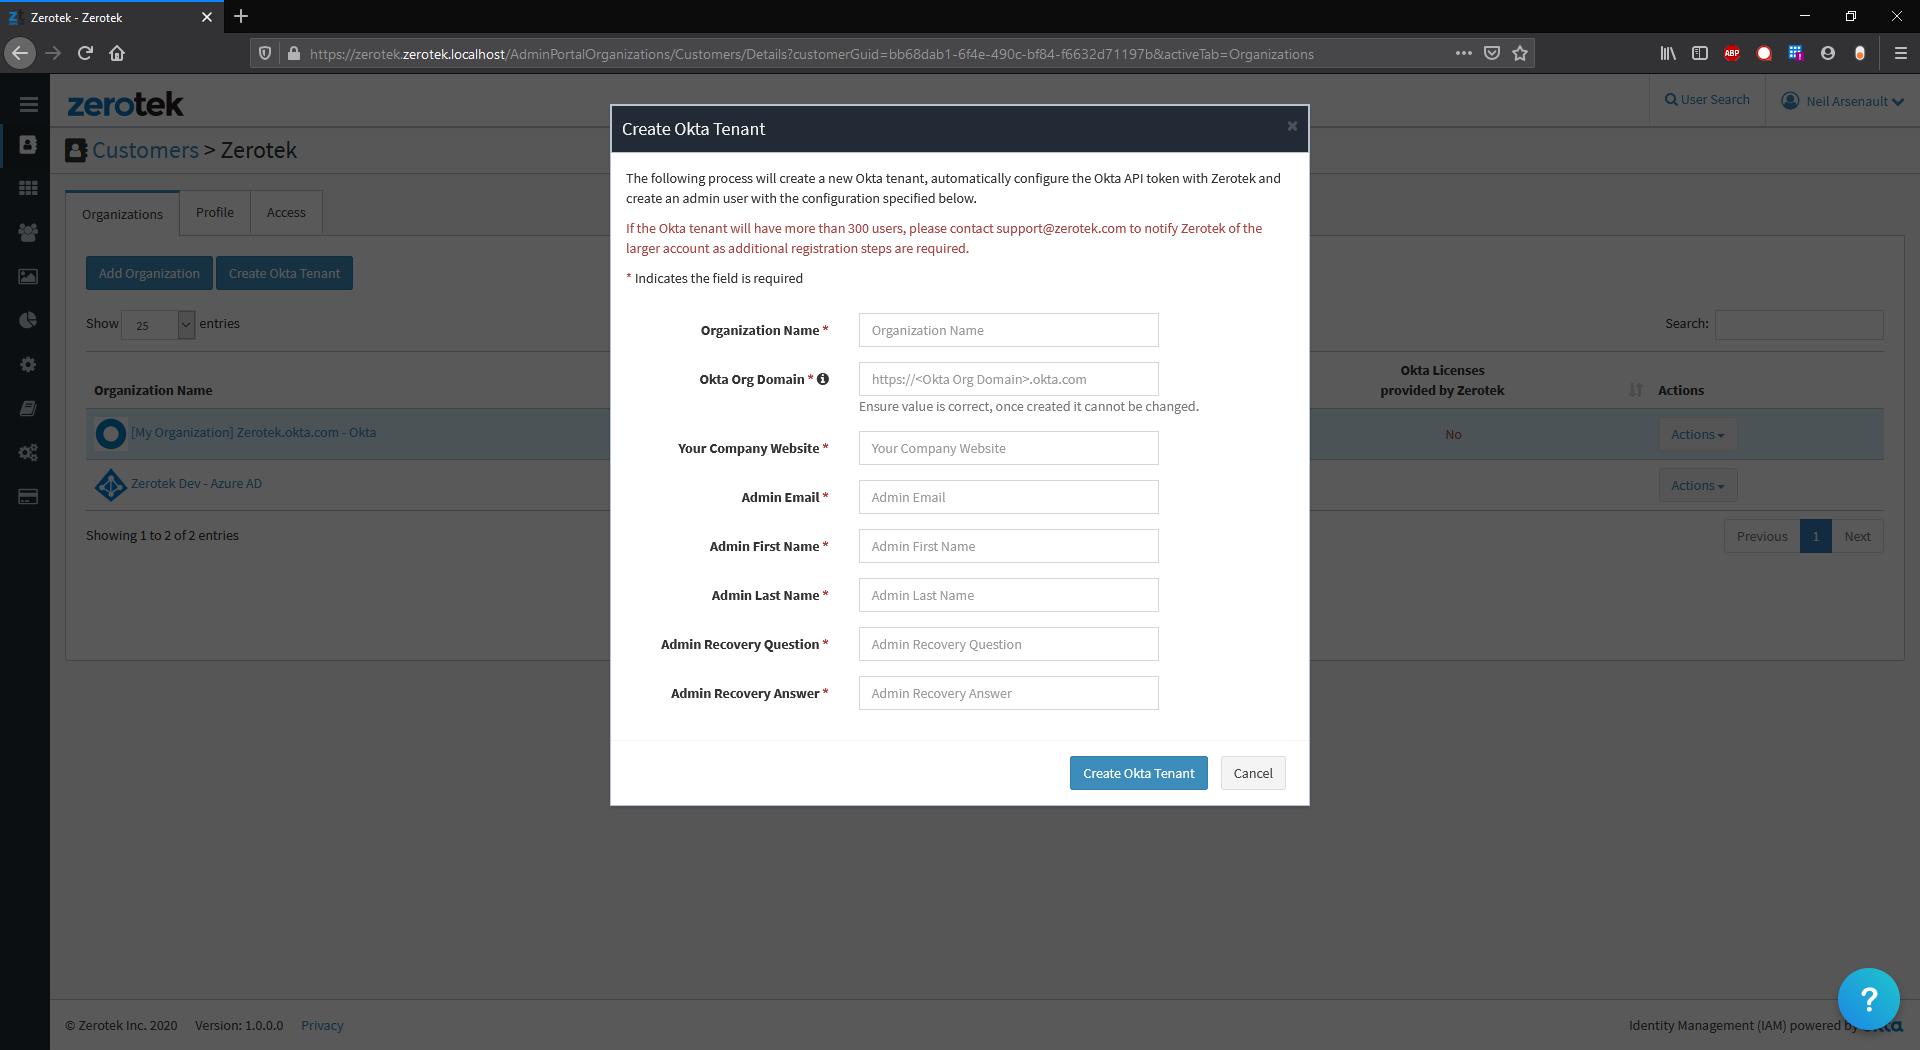 Create New Customer / New Okta Tenant